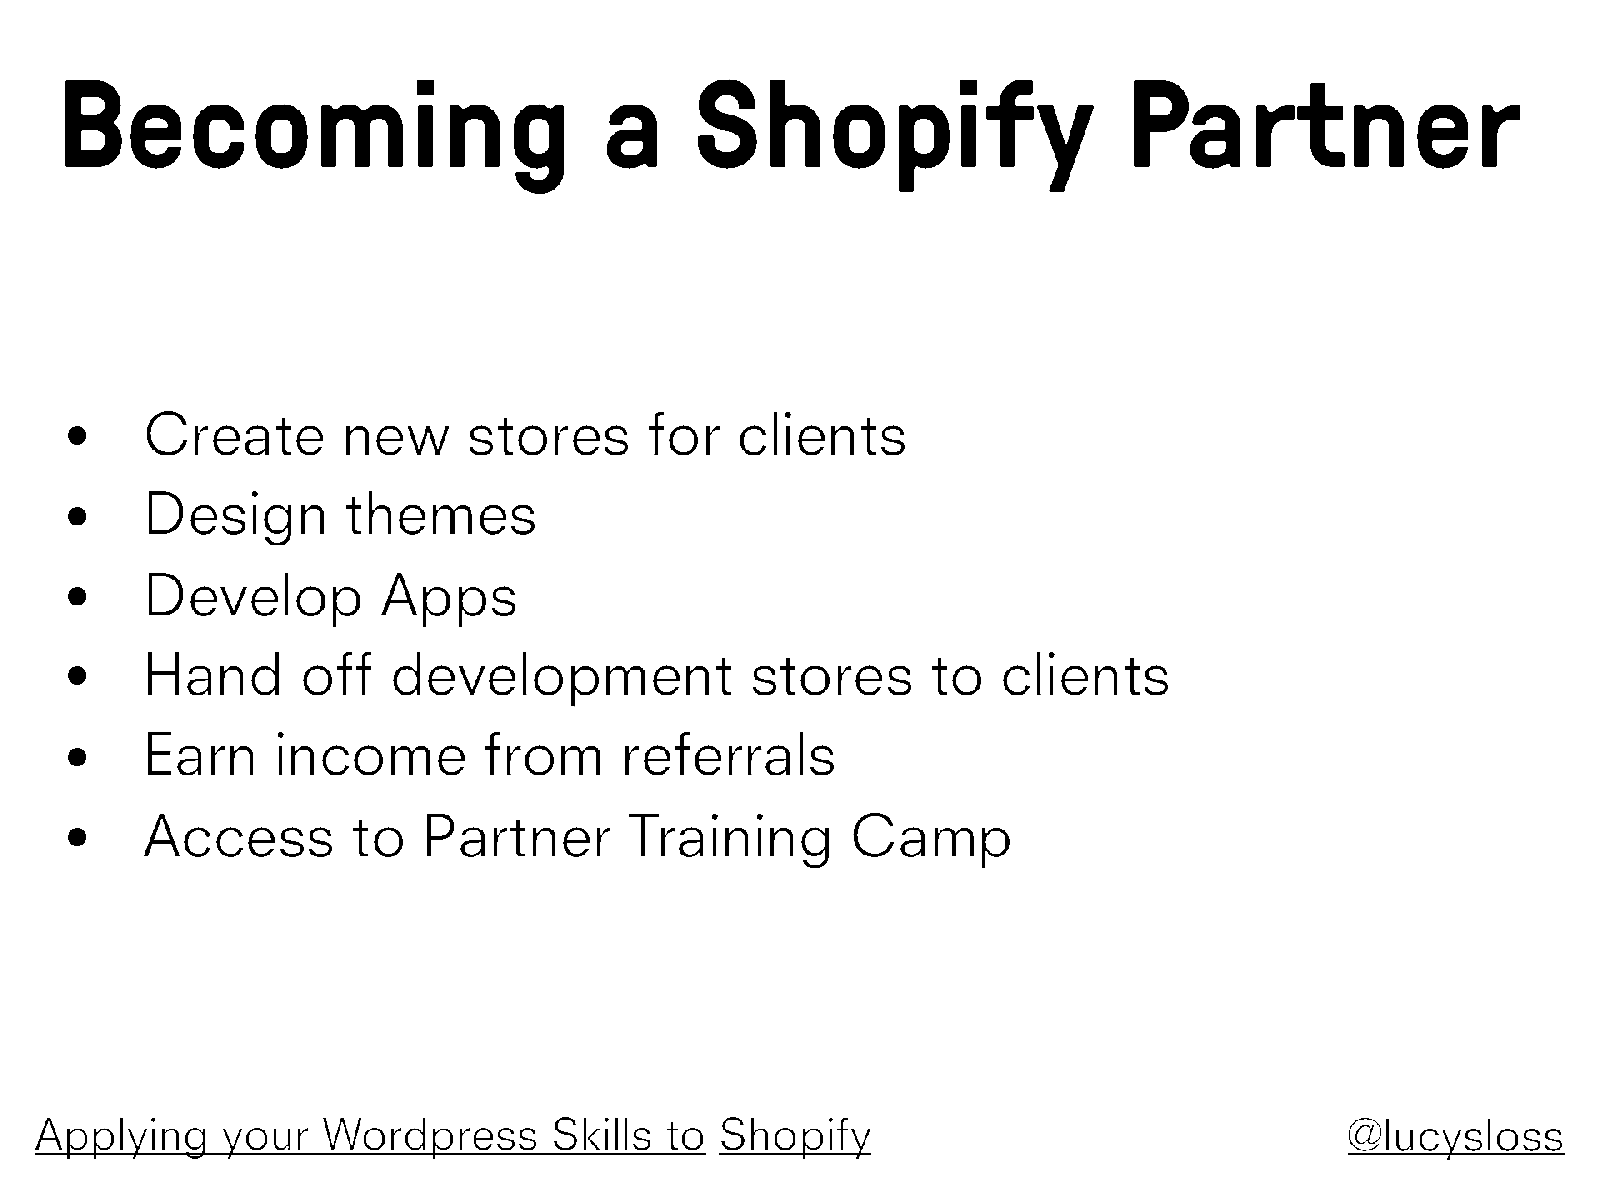 Applying your Wordpress skills to Shopify